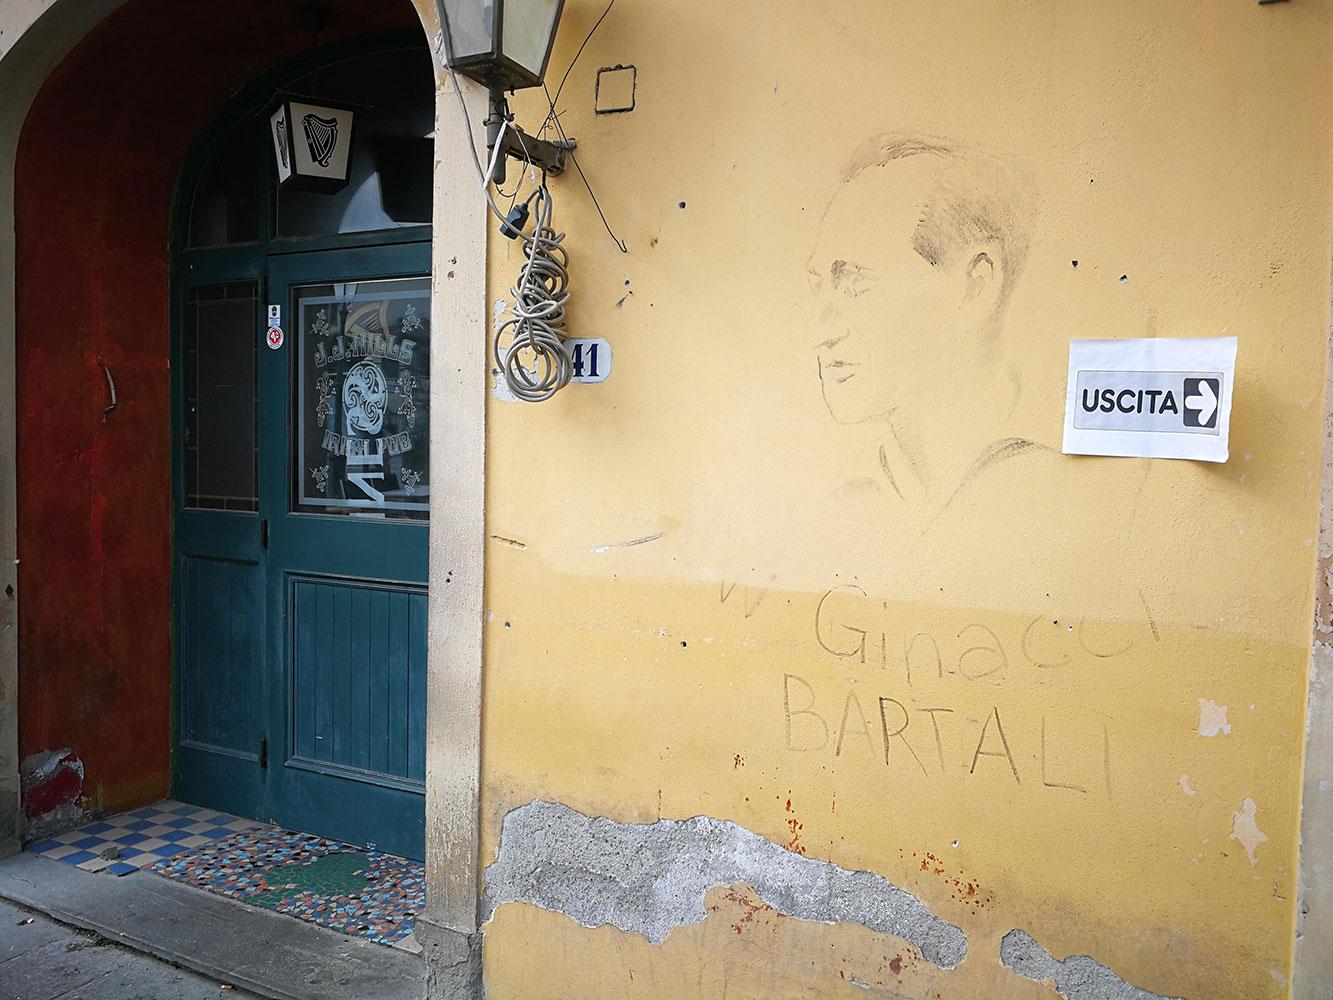 gino-bartali-fiesole